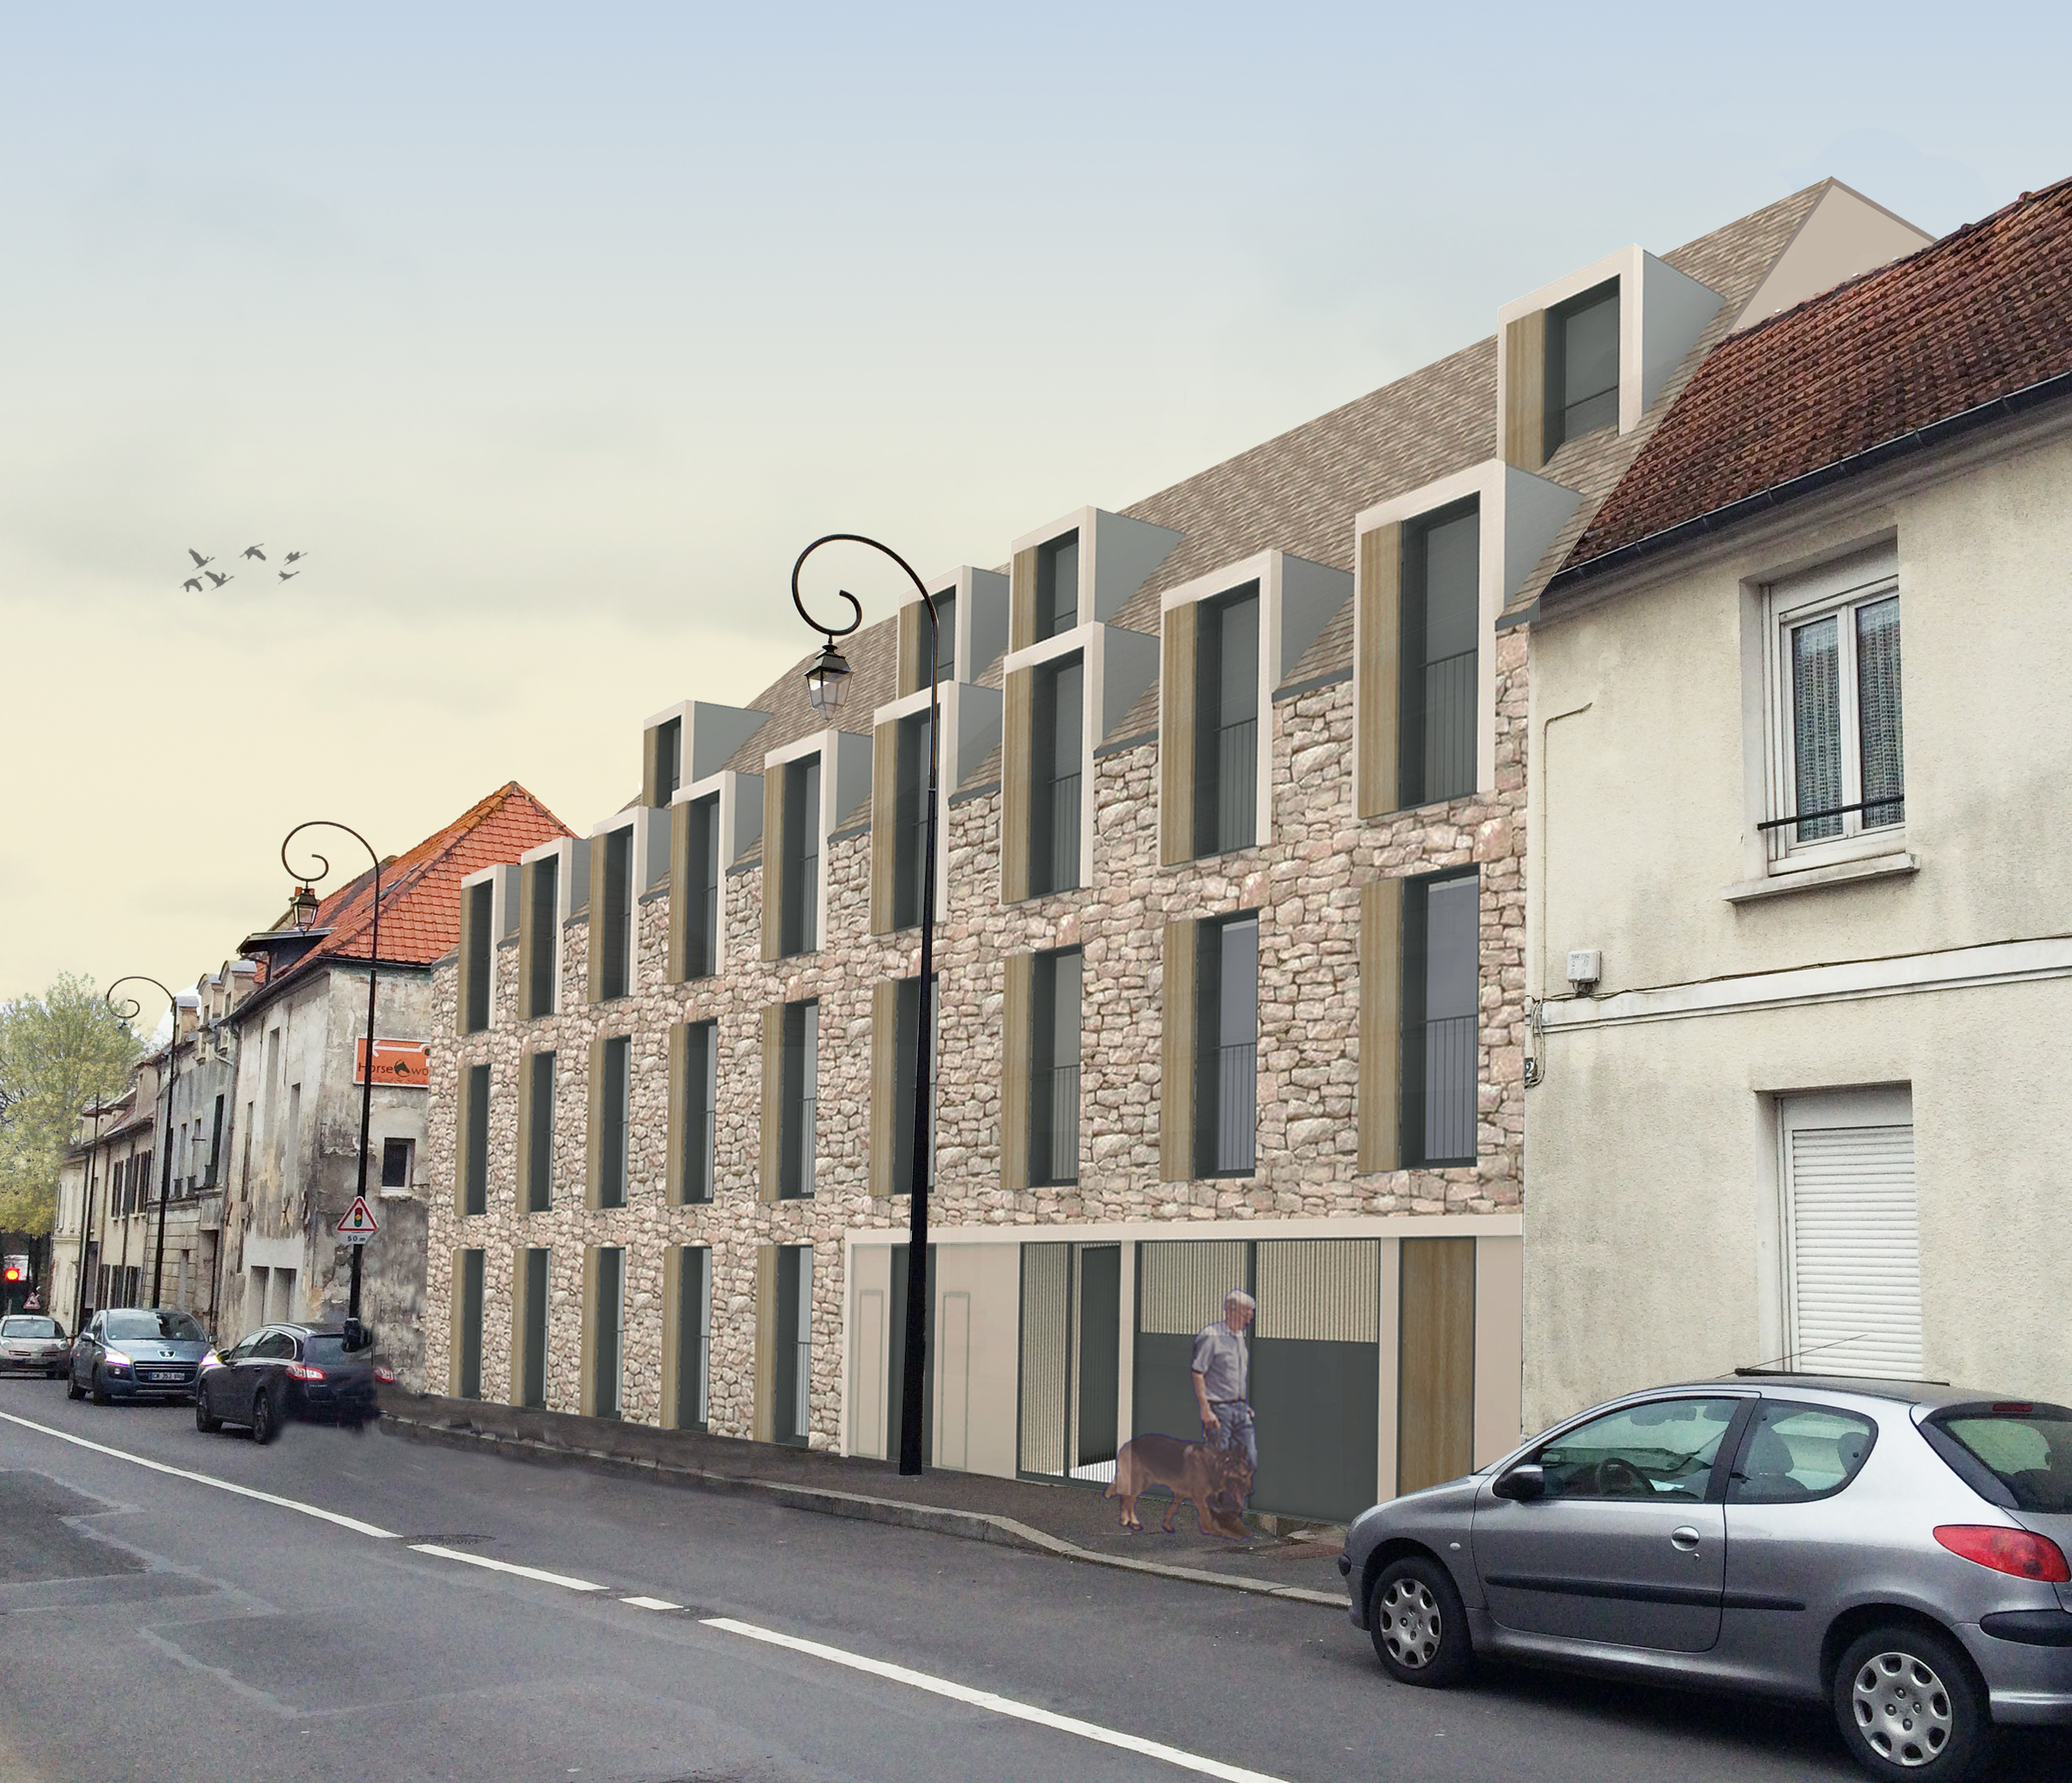 37 housing units at saint brice sous foret alexandru senciuc. Black Bedroom Furniture Sets. Home Design Ideas